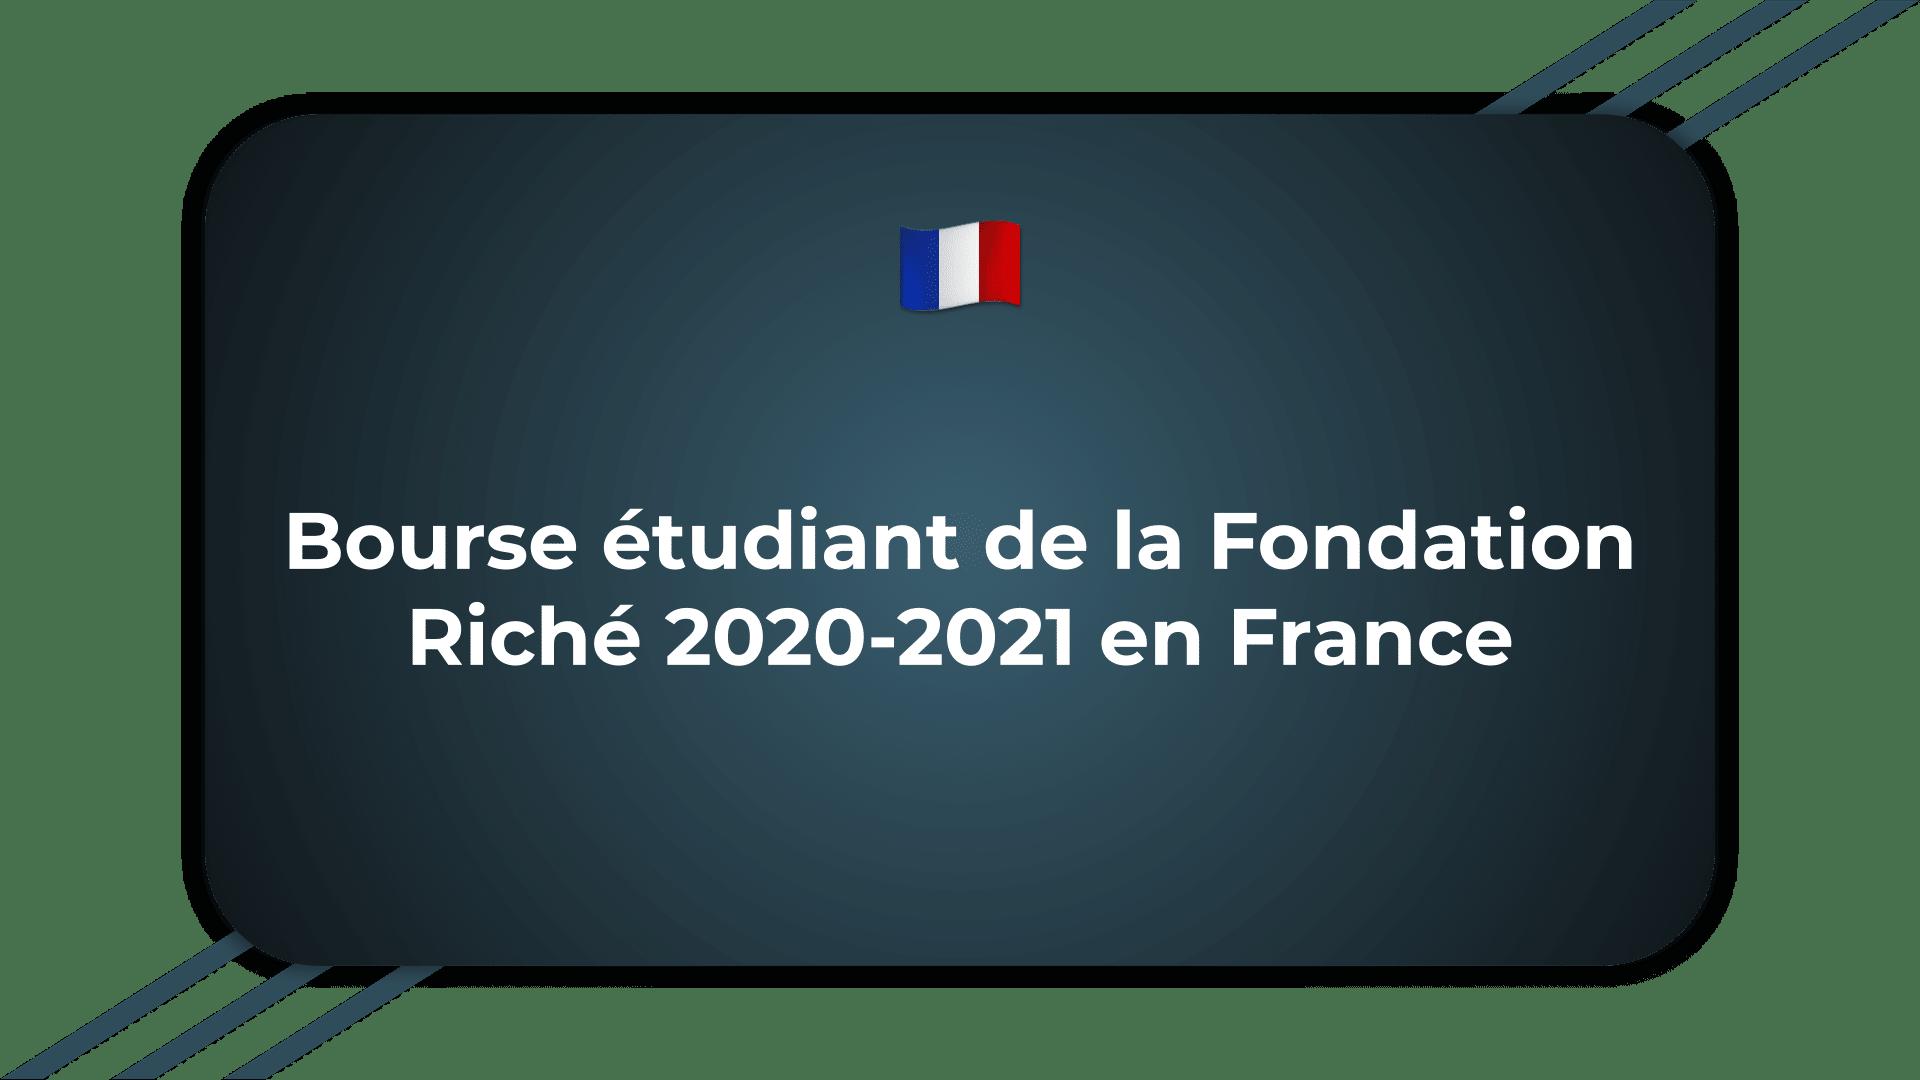 Bourse Fondation Riché